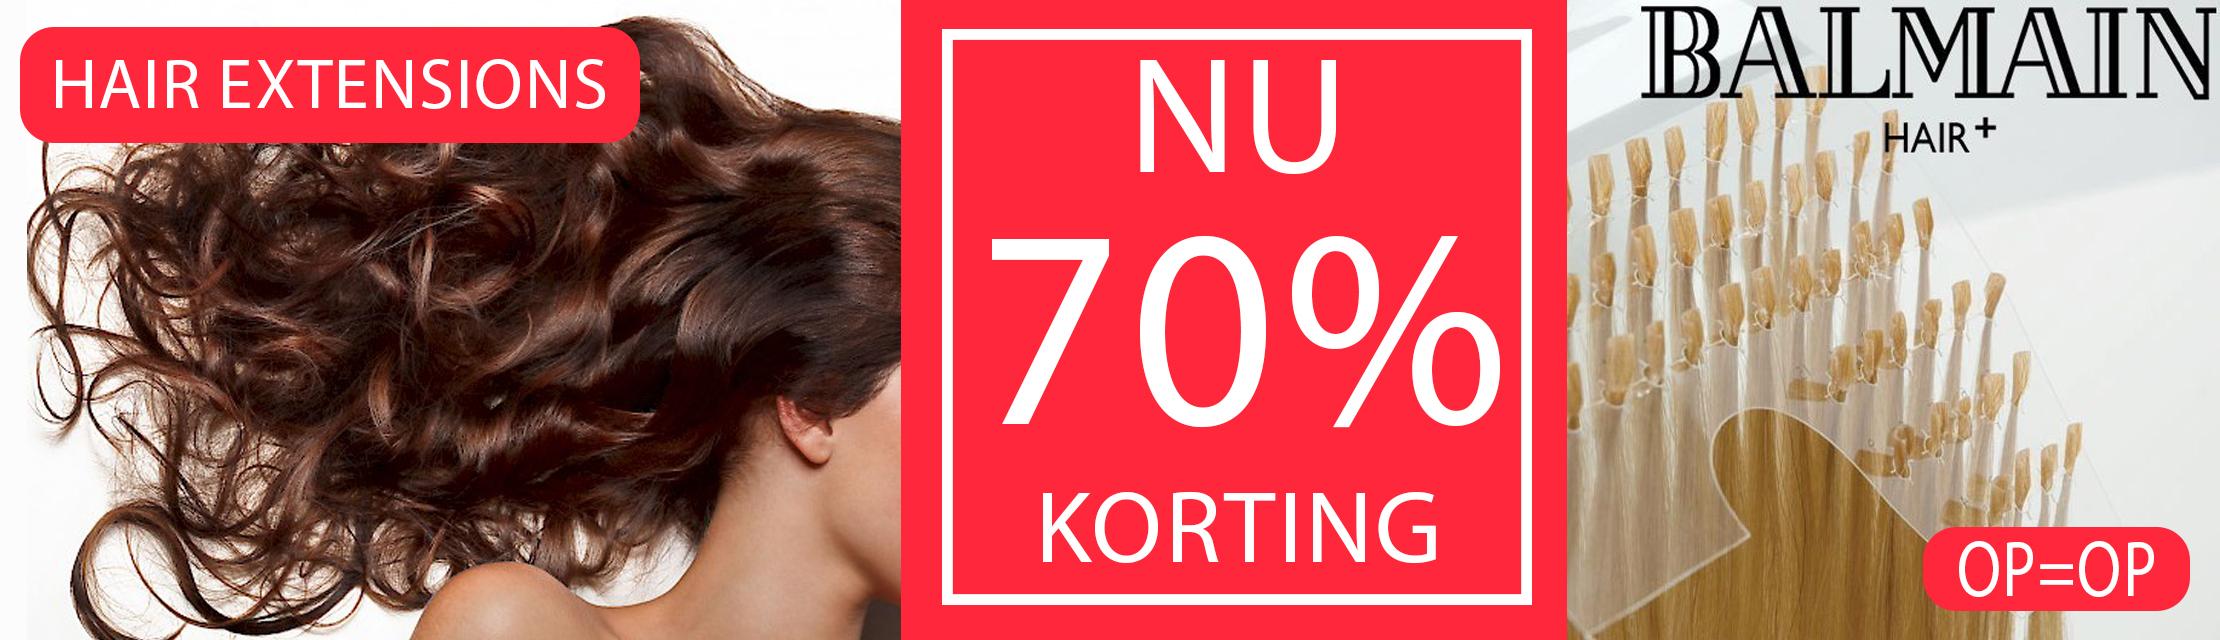 BALMAIN HAIR EXTENSIONS 70% KORTING!!